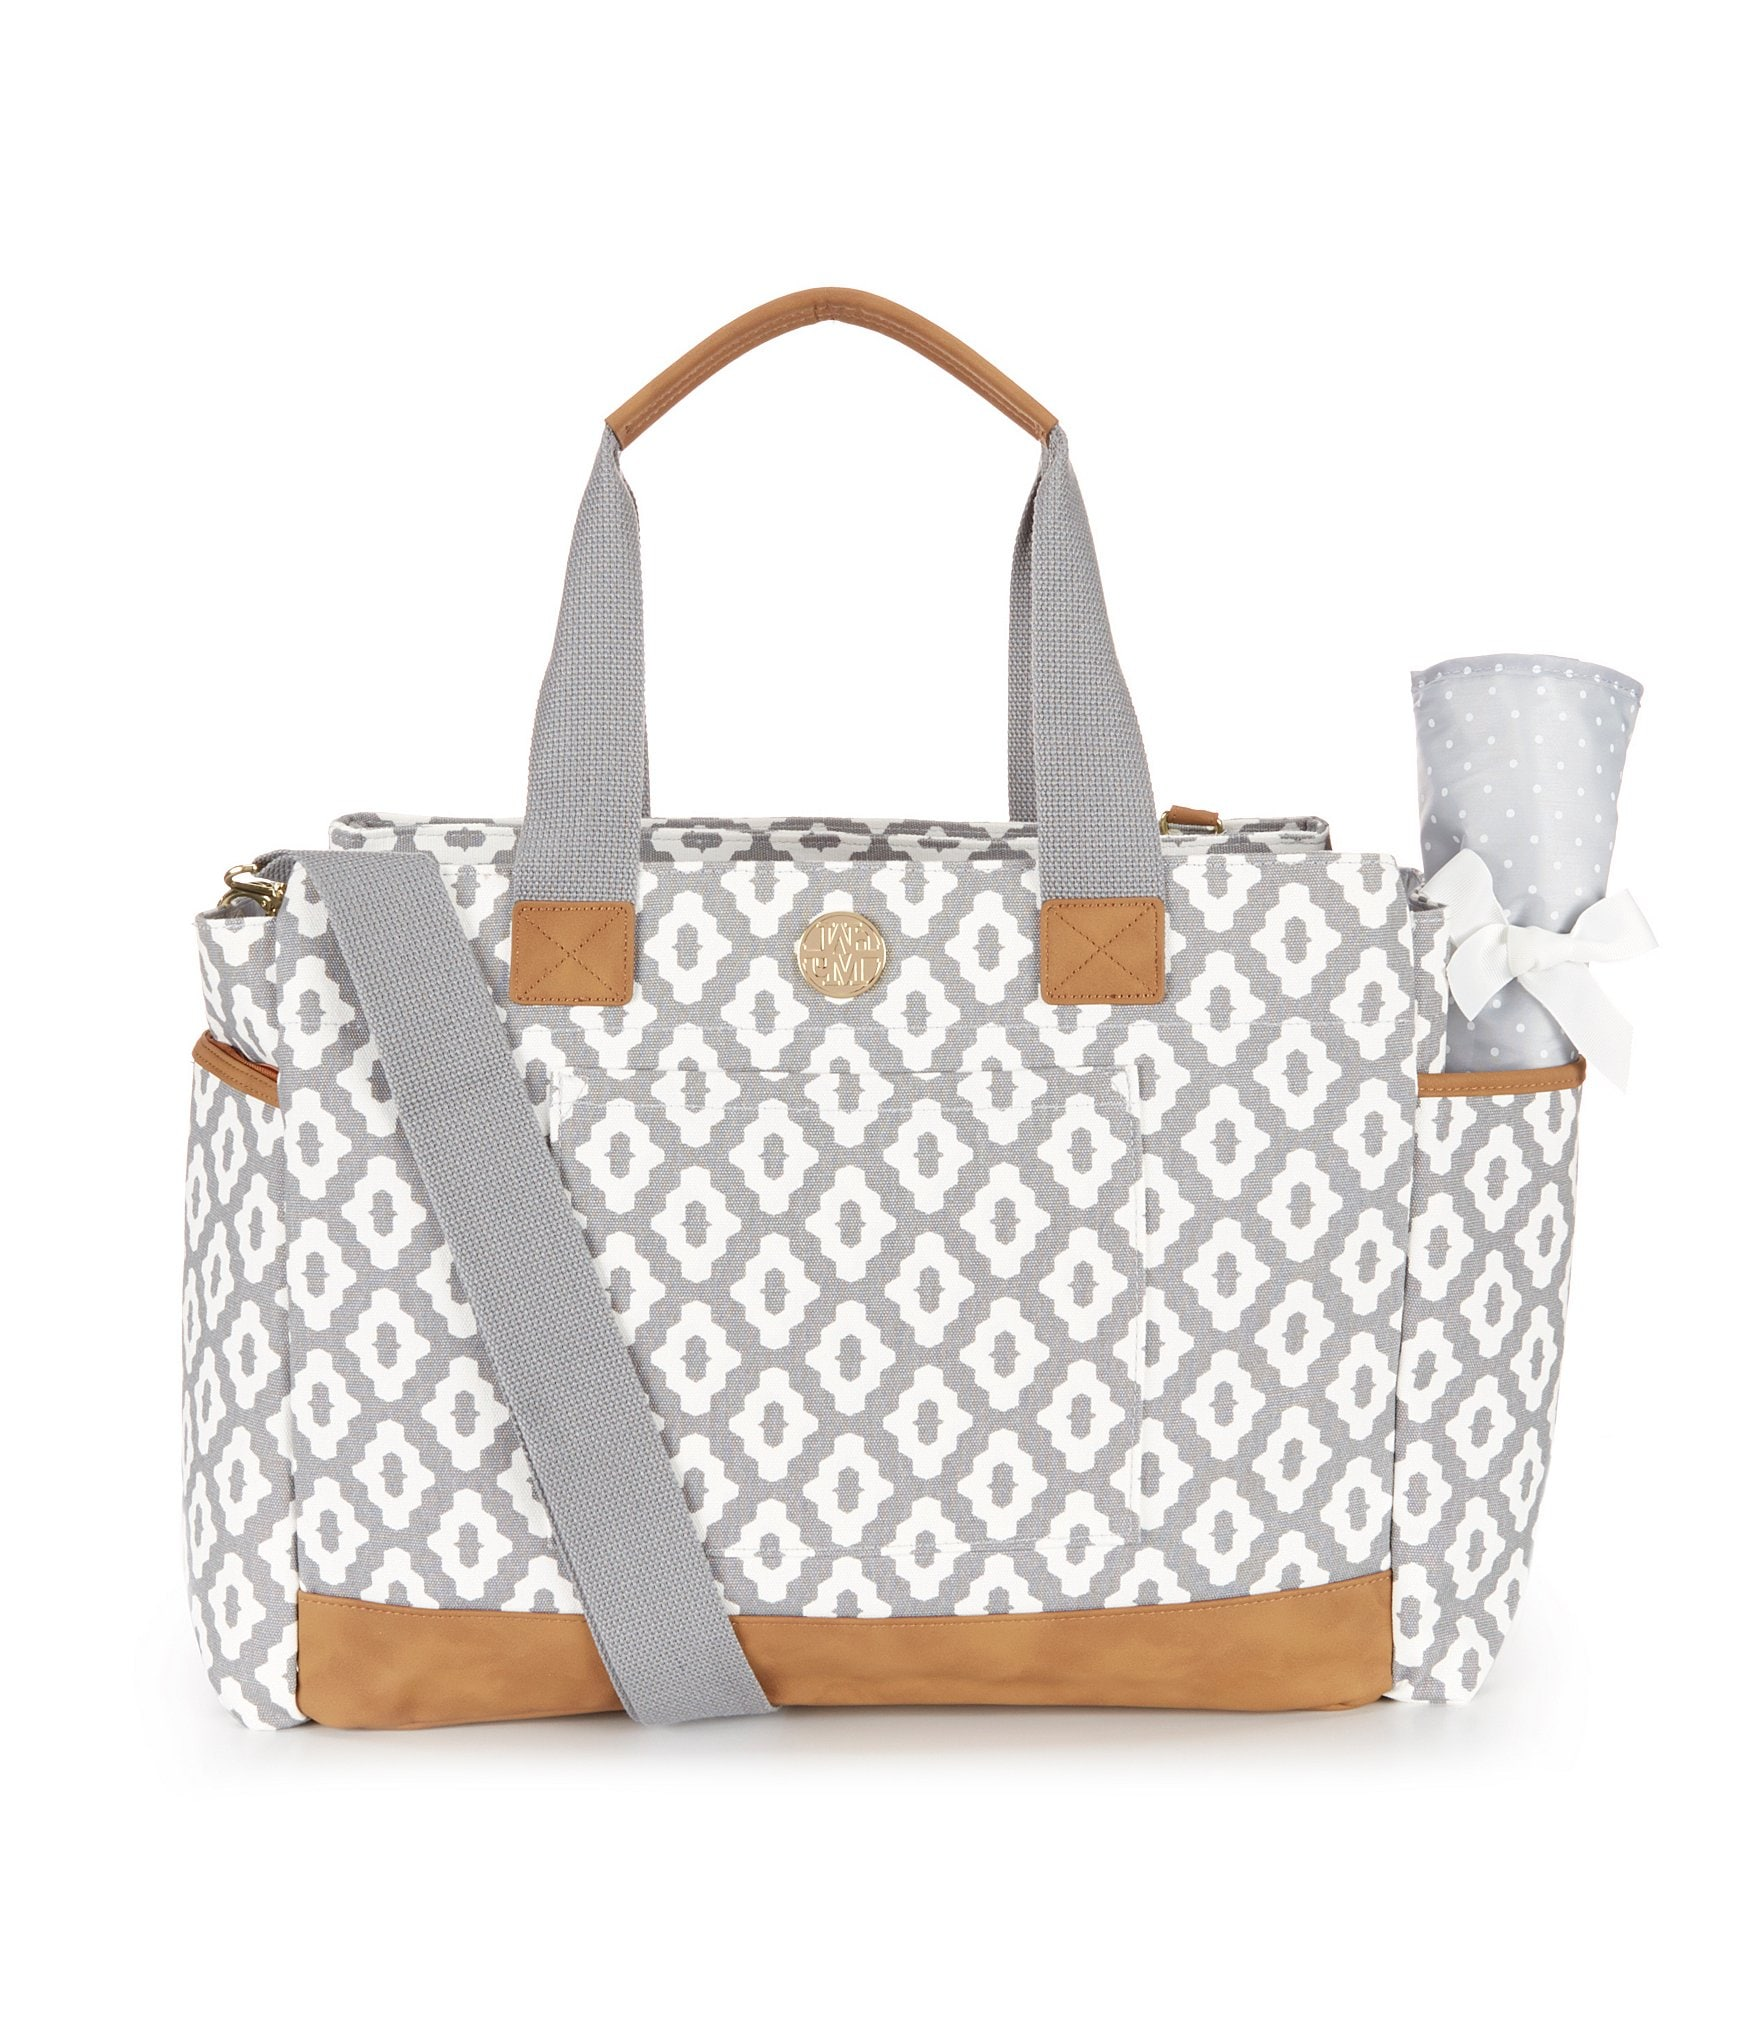 handbags  diaper bags  dillardscom -